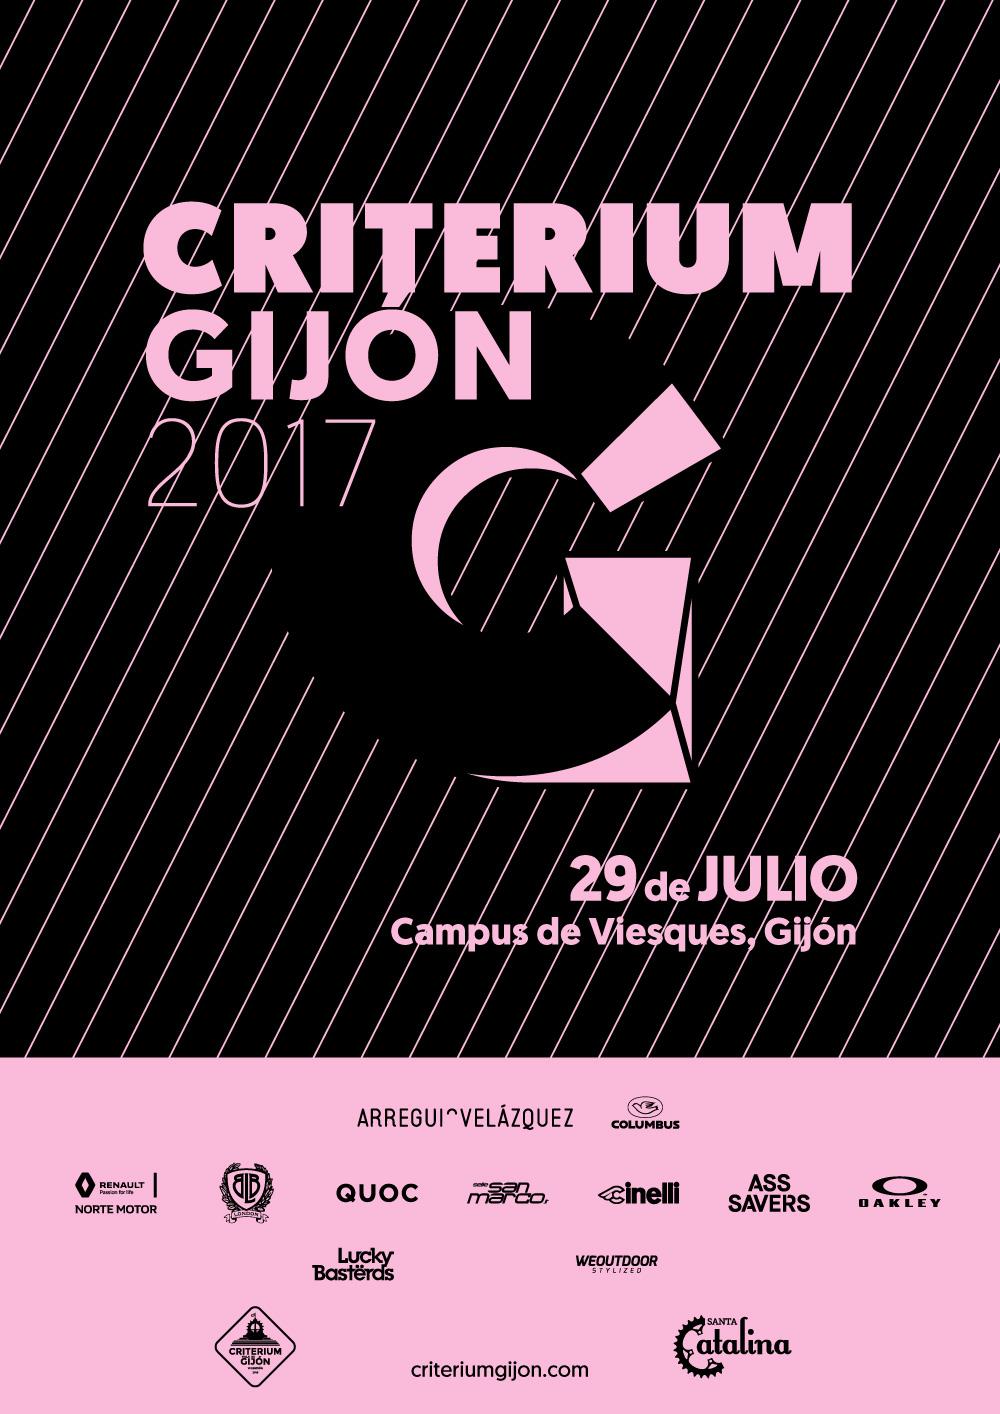 https://robertotunon.com/wp-content/uploads/2017/05/robertotunon_criteriumgijon2017-cartel_01.jpgCriterium Gijón 2017